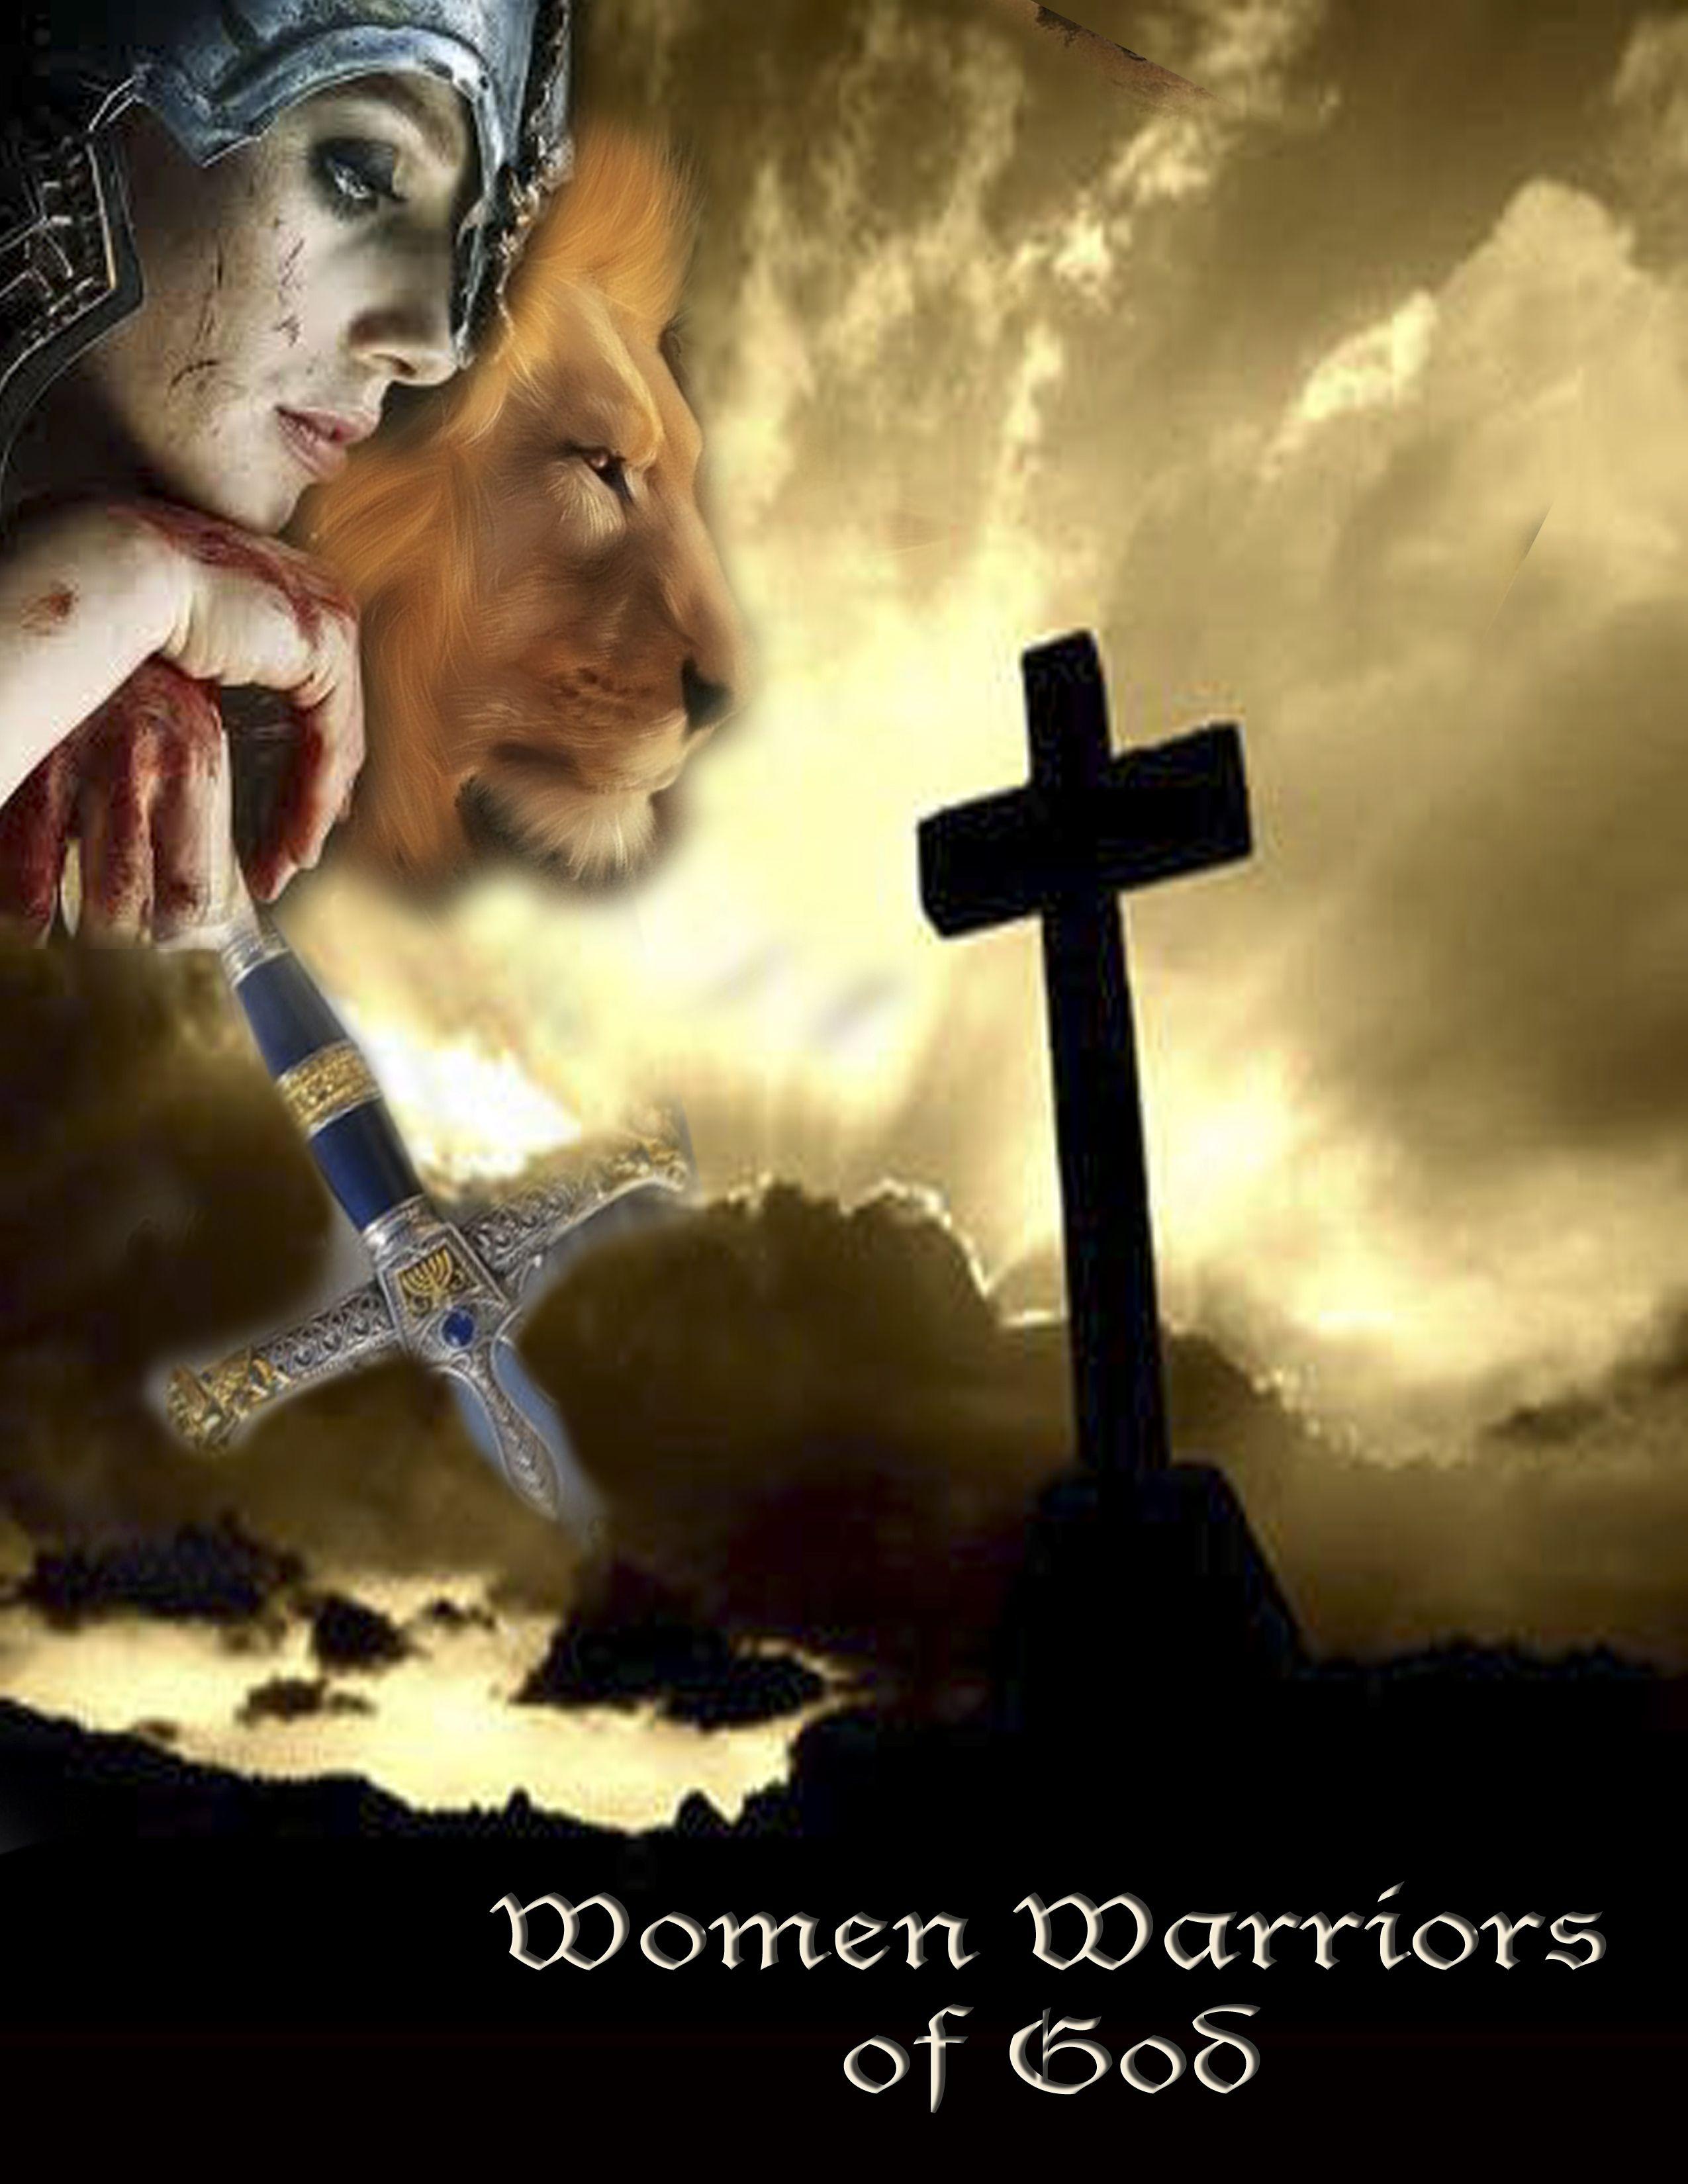 Women Warriors Of God